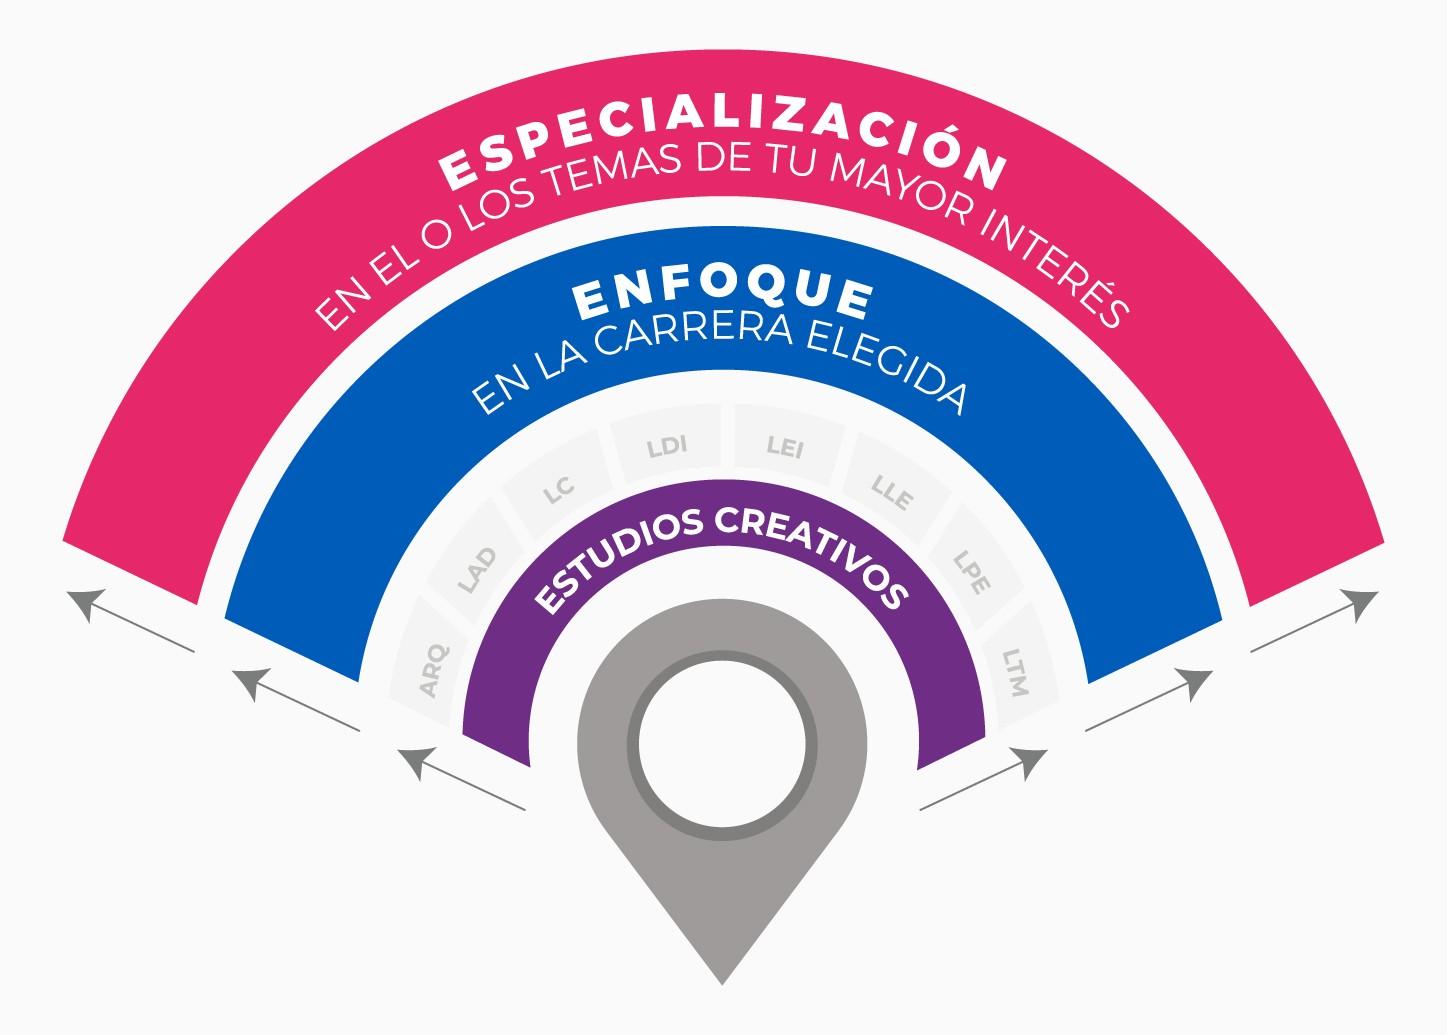 Estudios creativos etapas del modelo